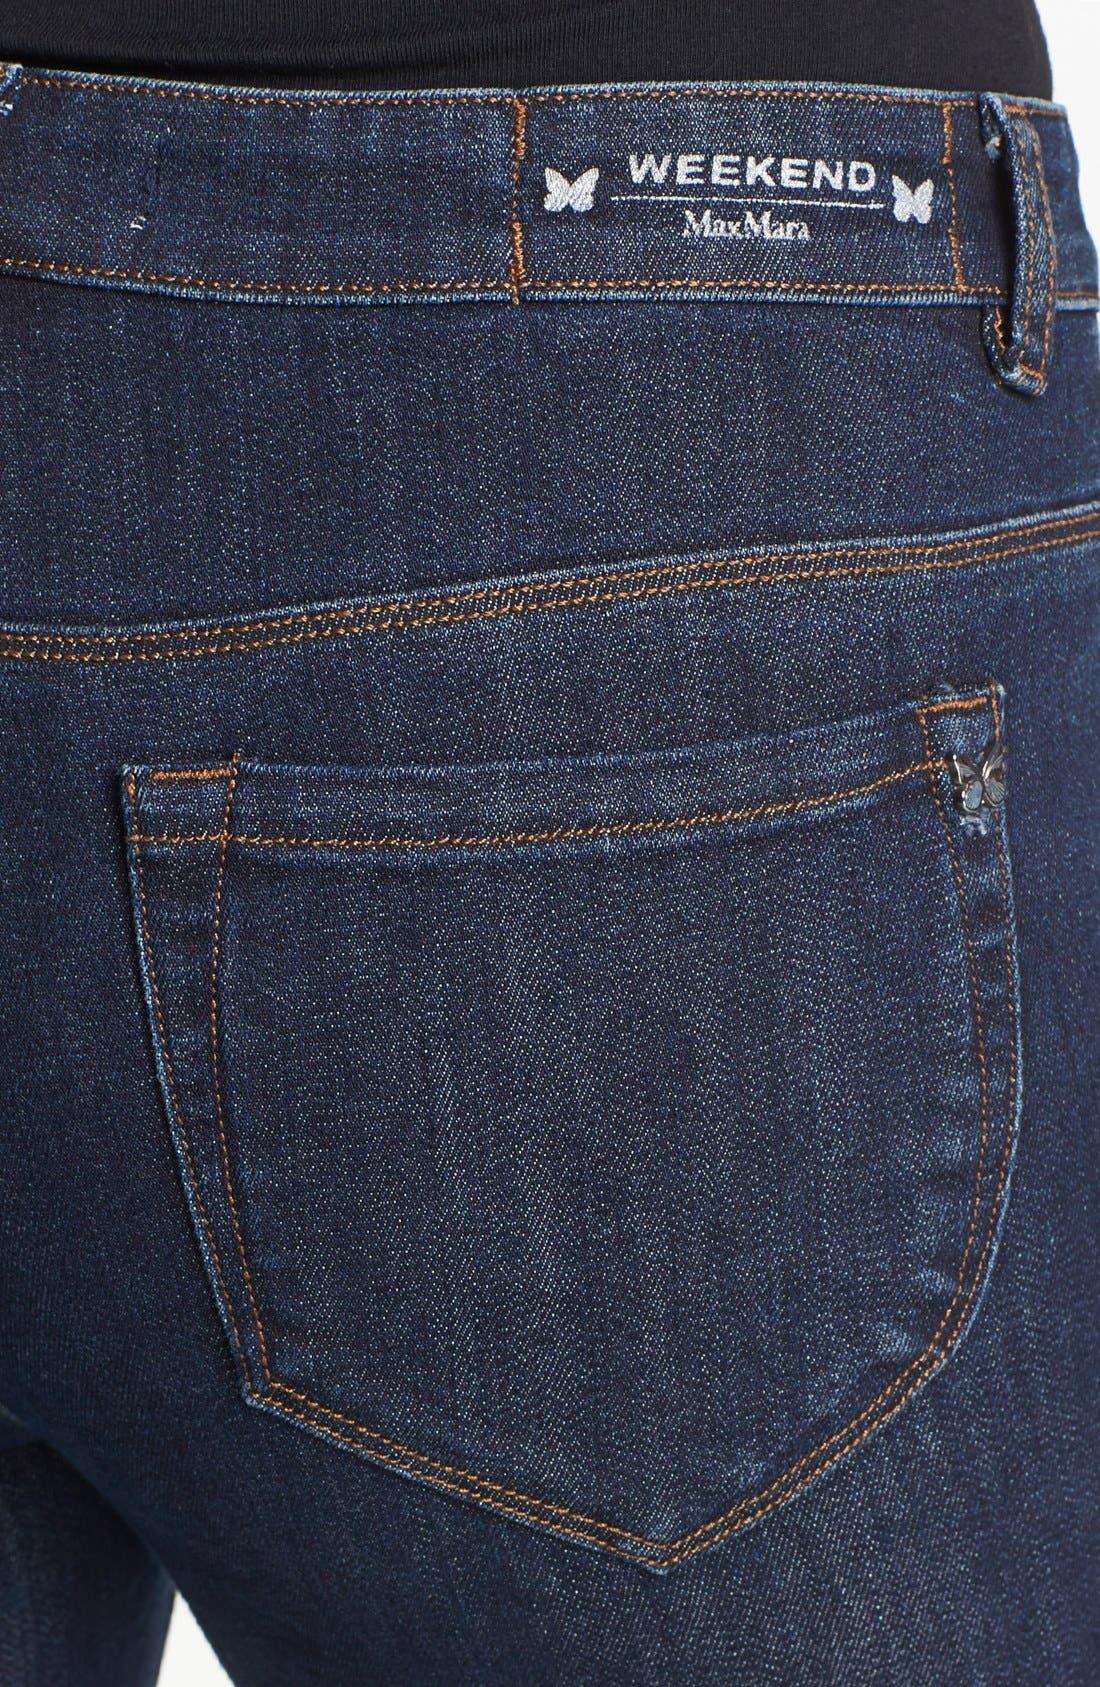 Alternate Image 4  - Weekend Max Mara 'Crimea' Jeans